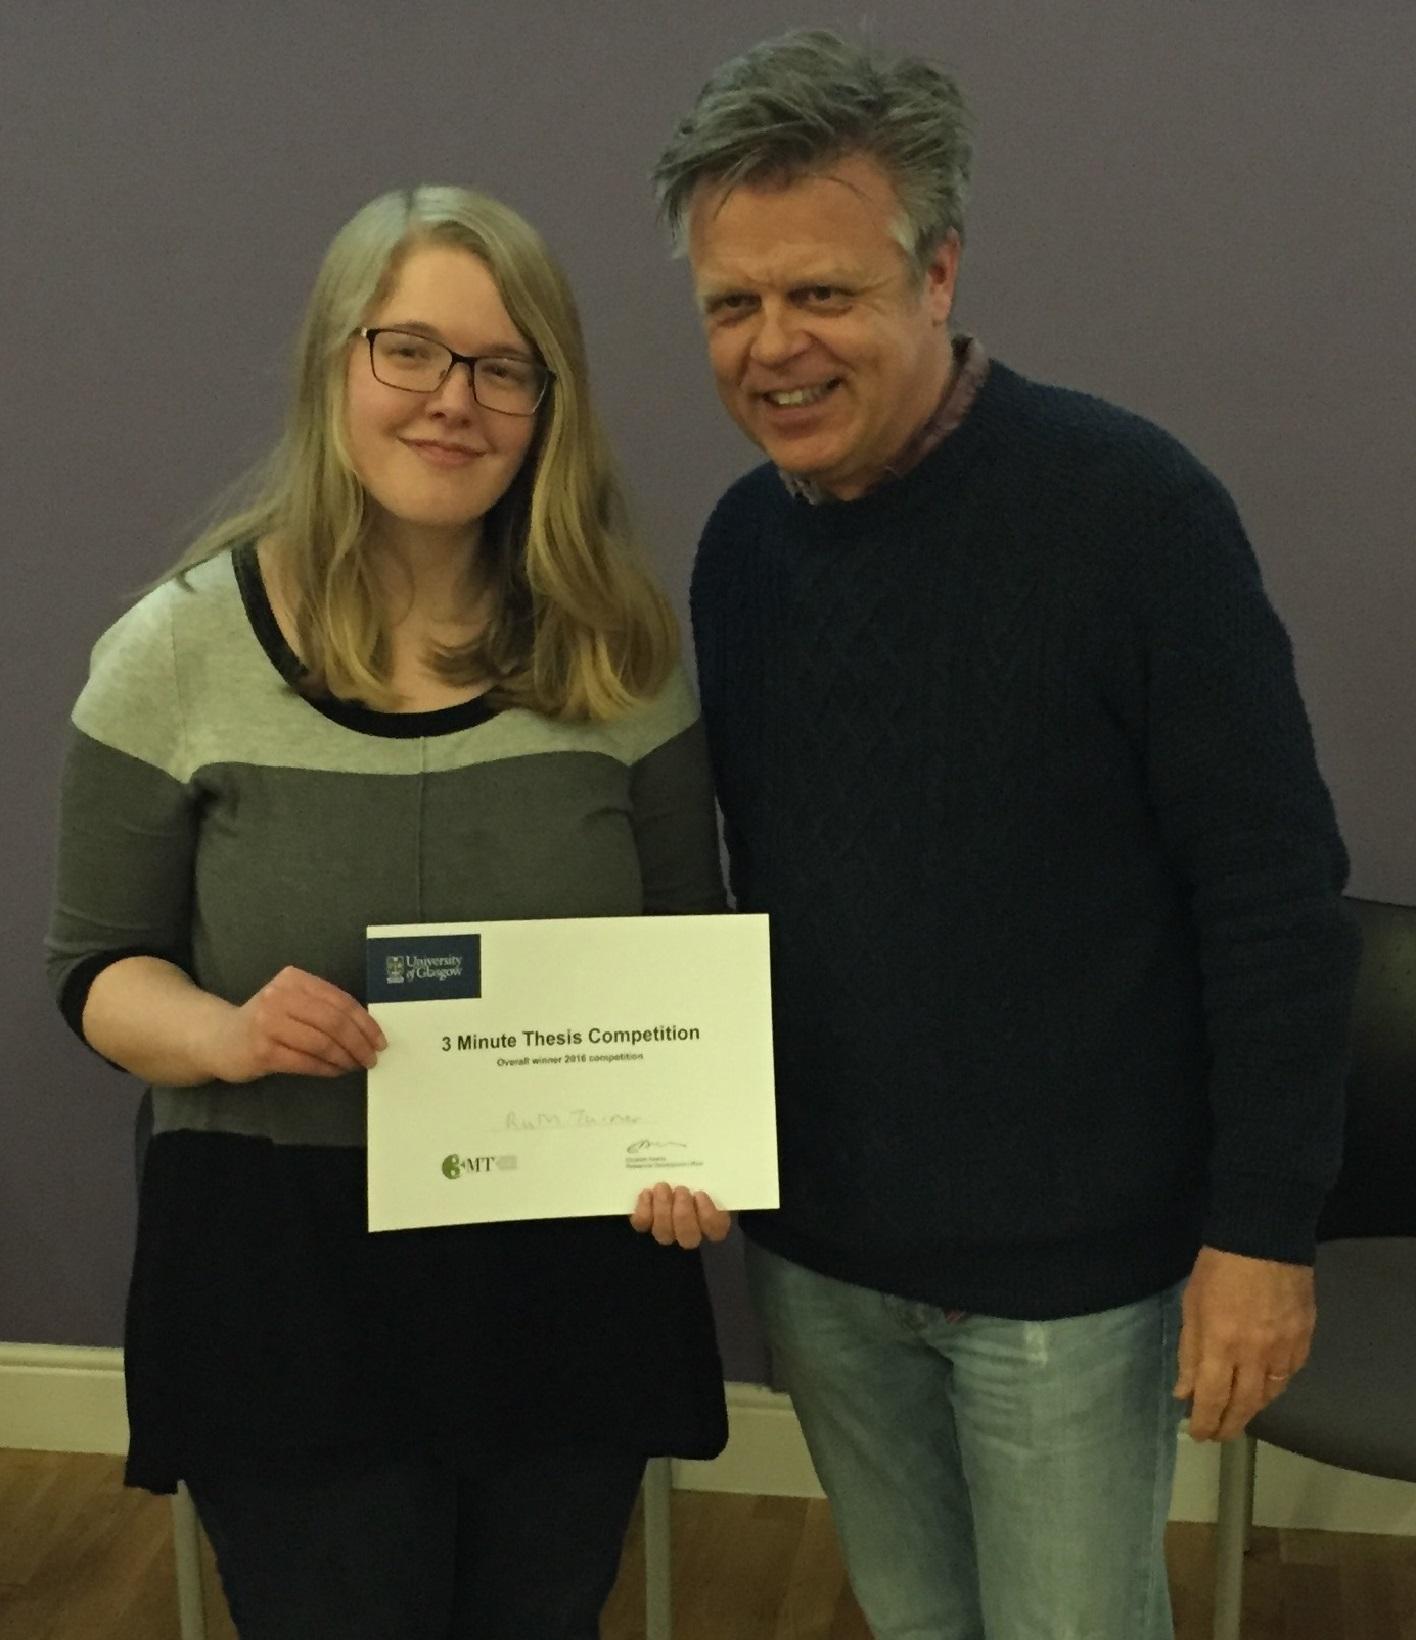 Ruth Turner, Winner of 3MThesis Humanities 2016, receiving her certificate